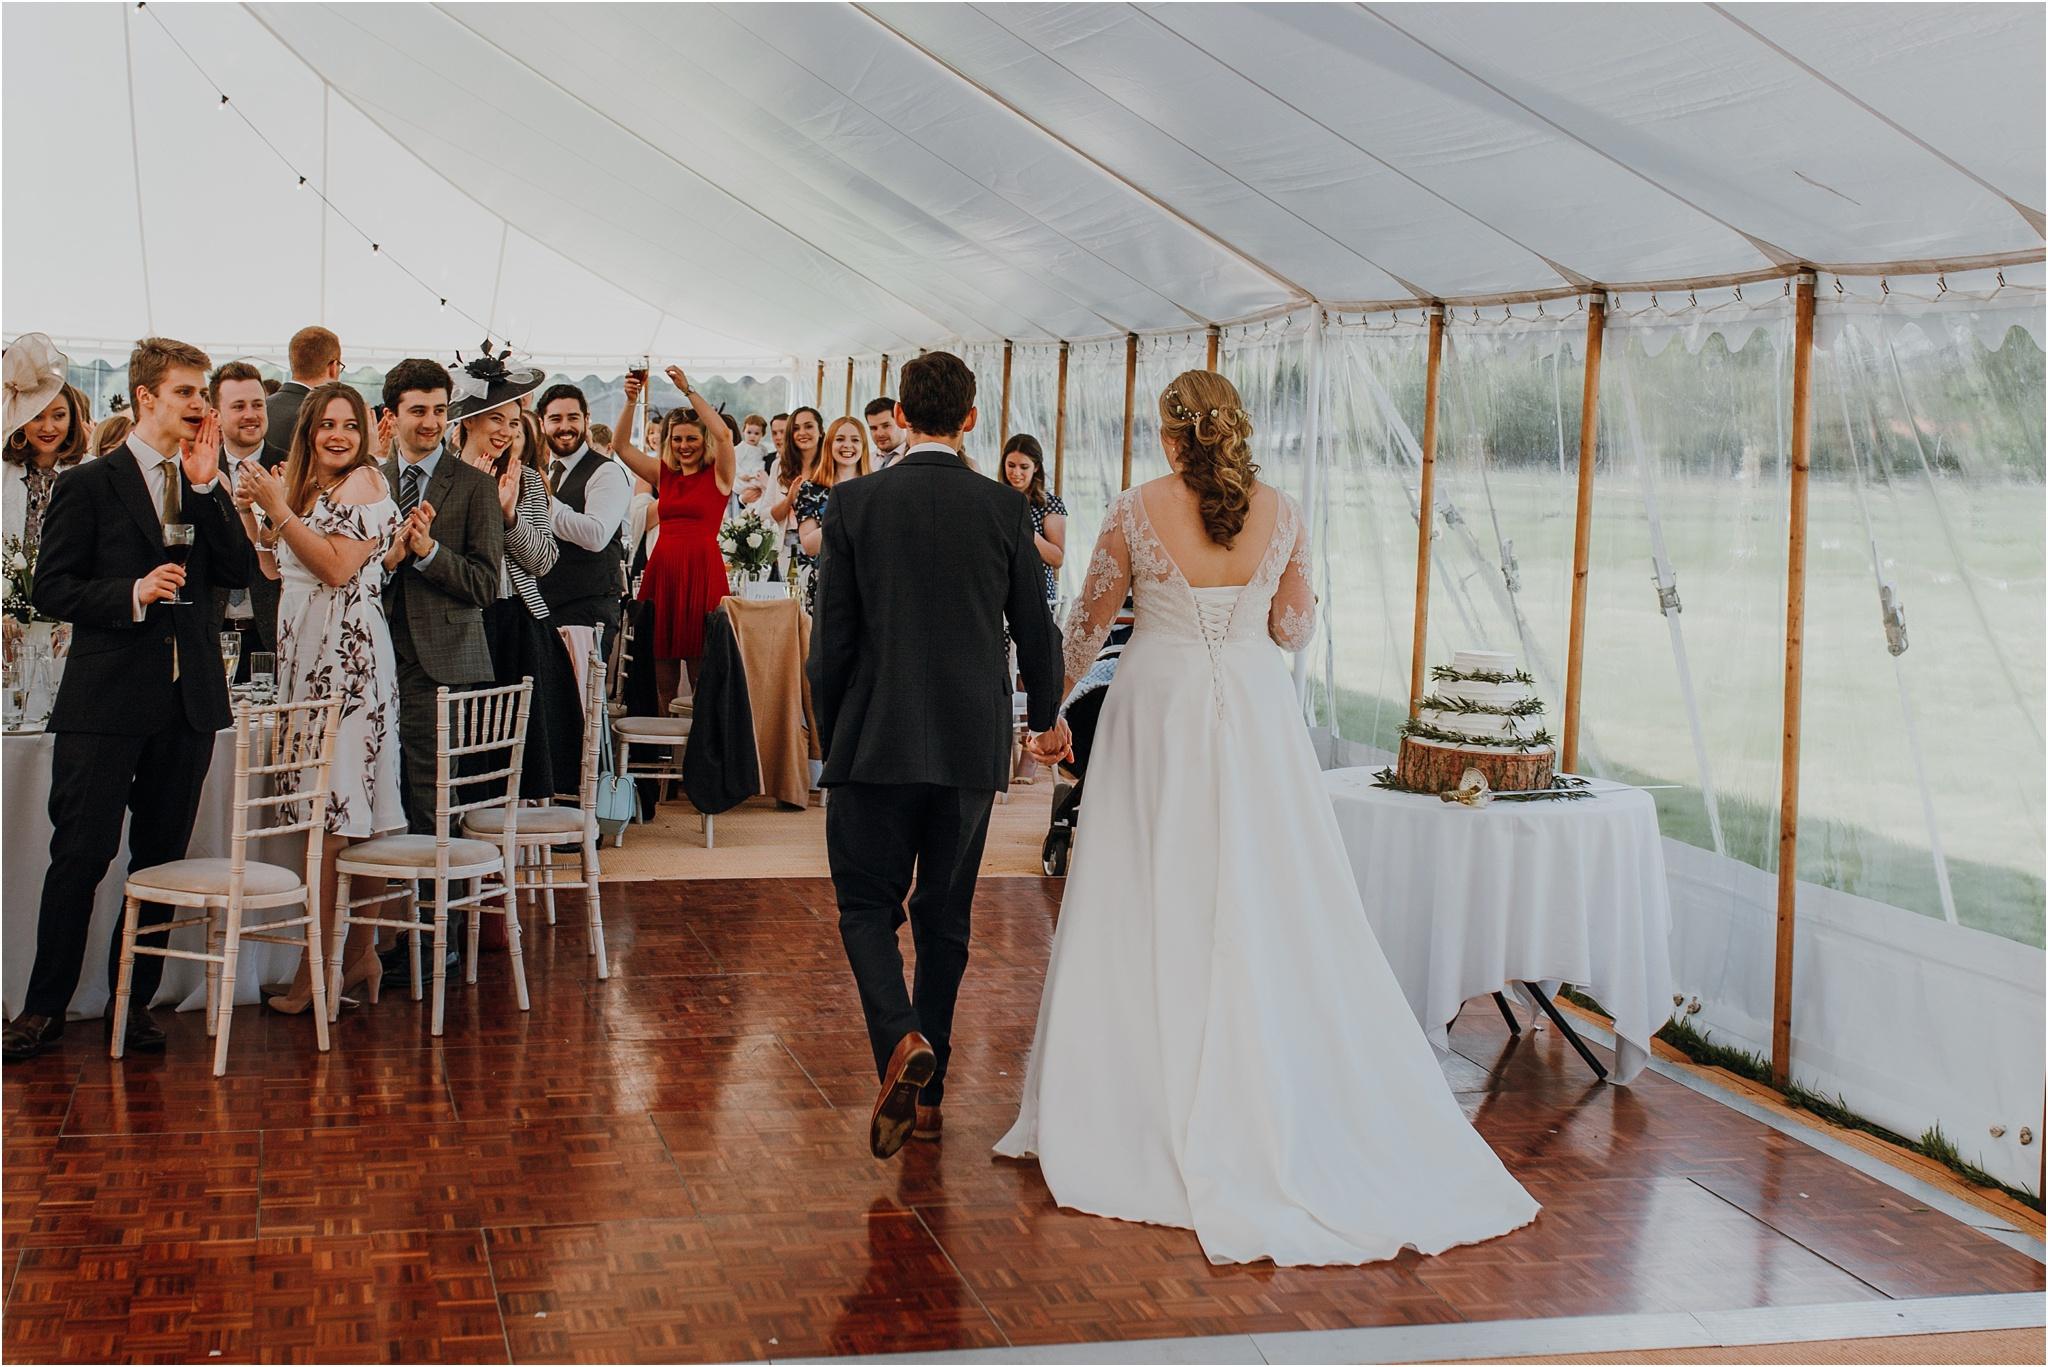 Outdoor-country-wedding-Edinburgh-photographer__0120.jpg